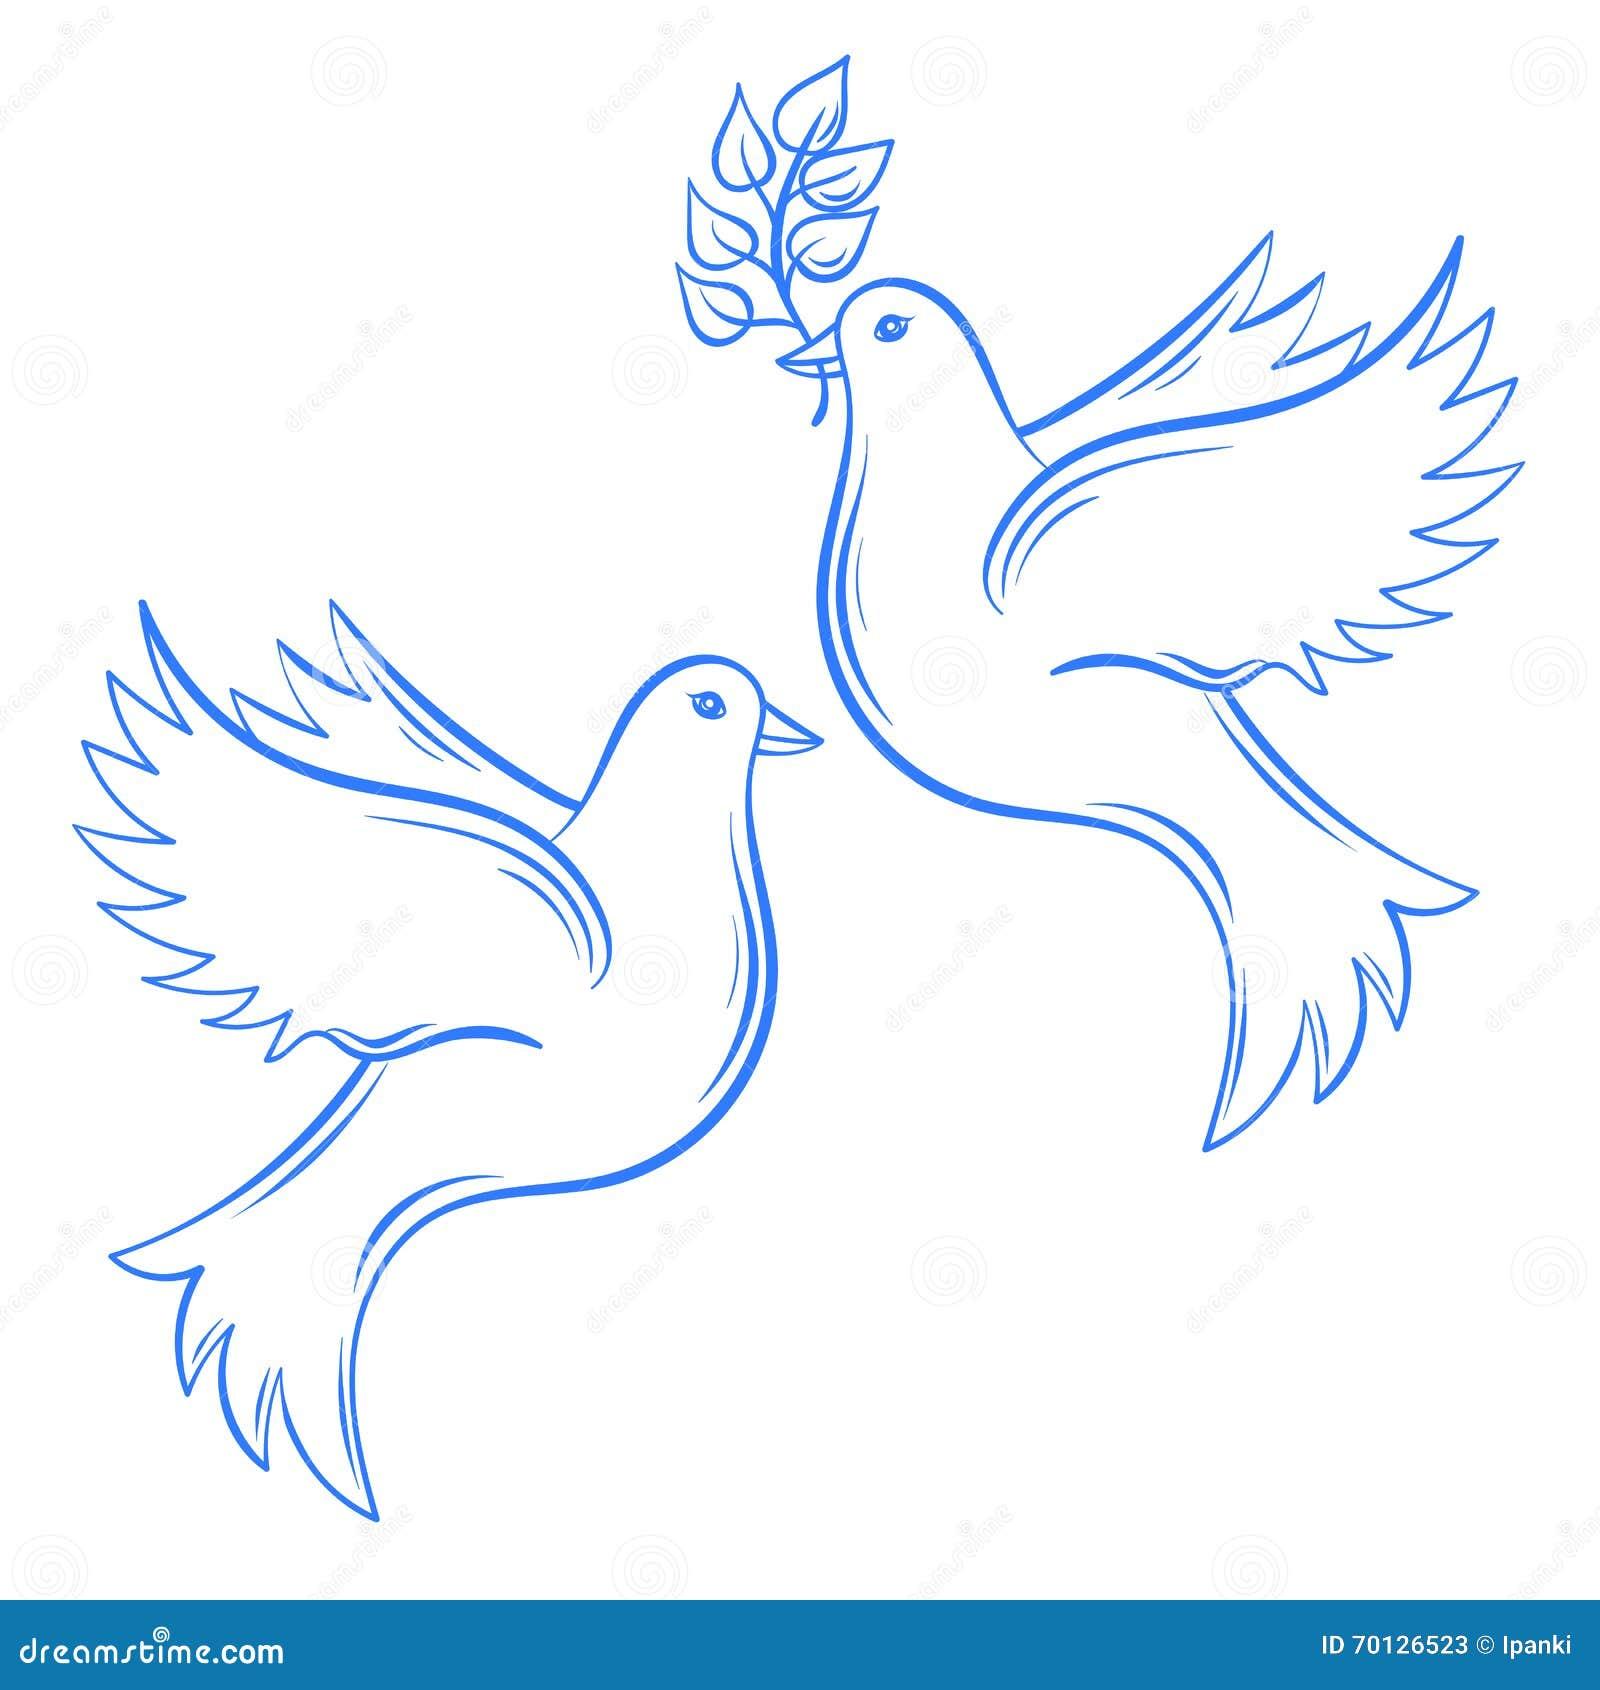 Картинки с нарисованными голубями